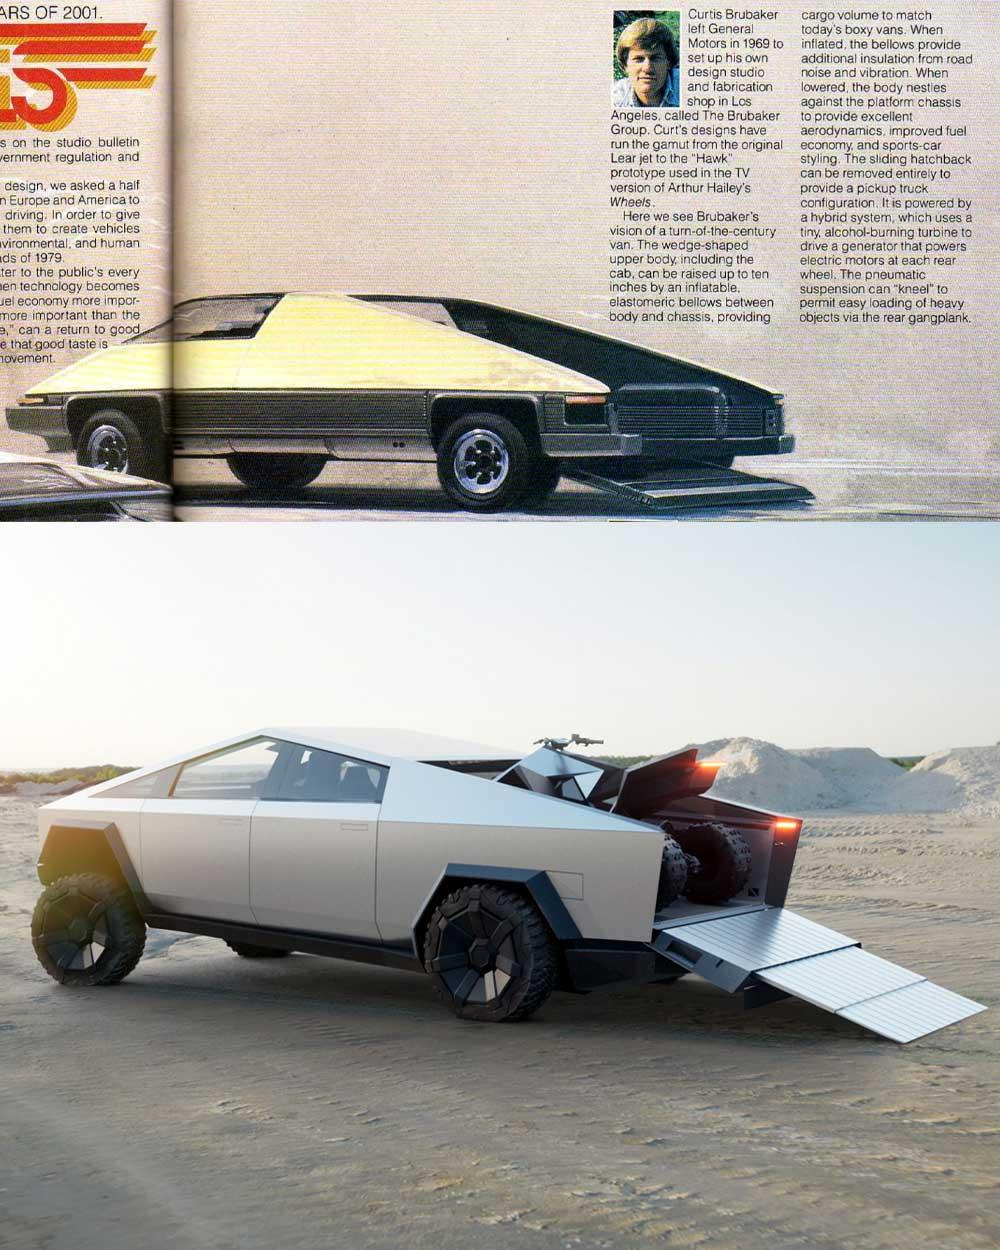 Tesla cybertruck futuristic retro